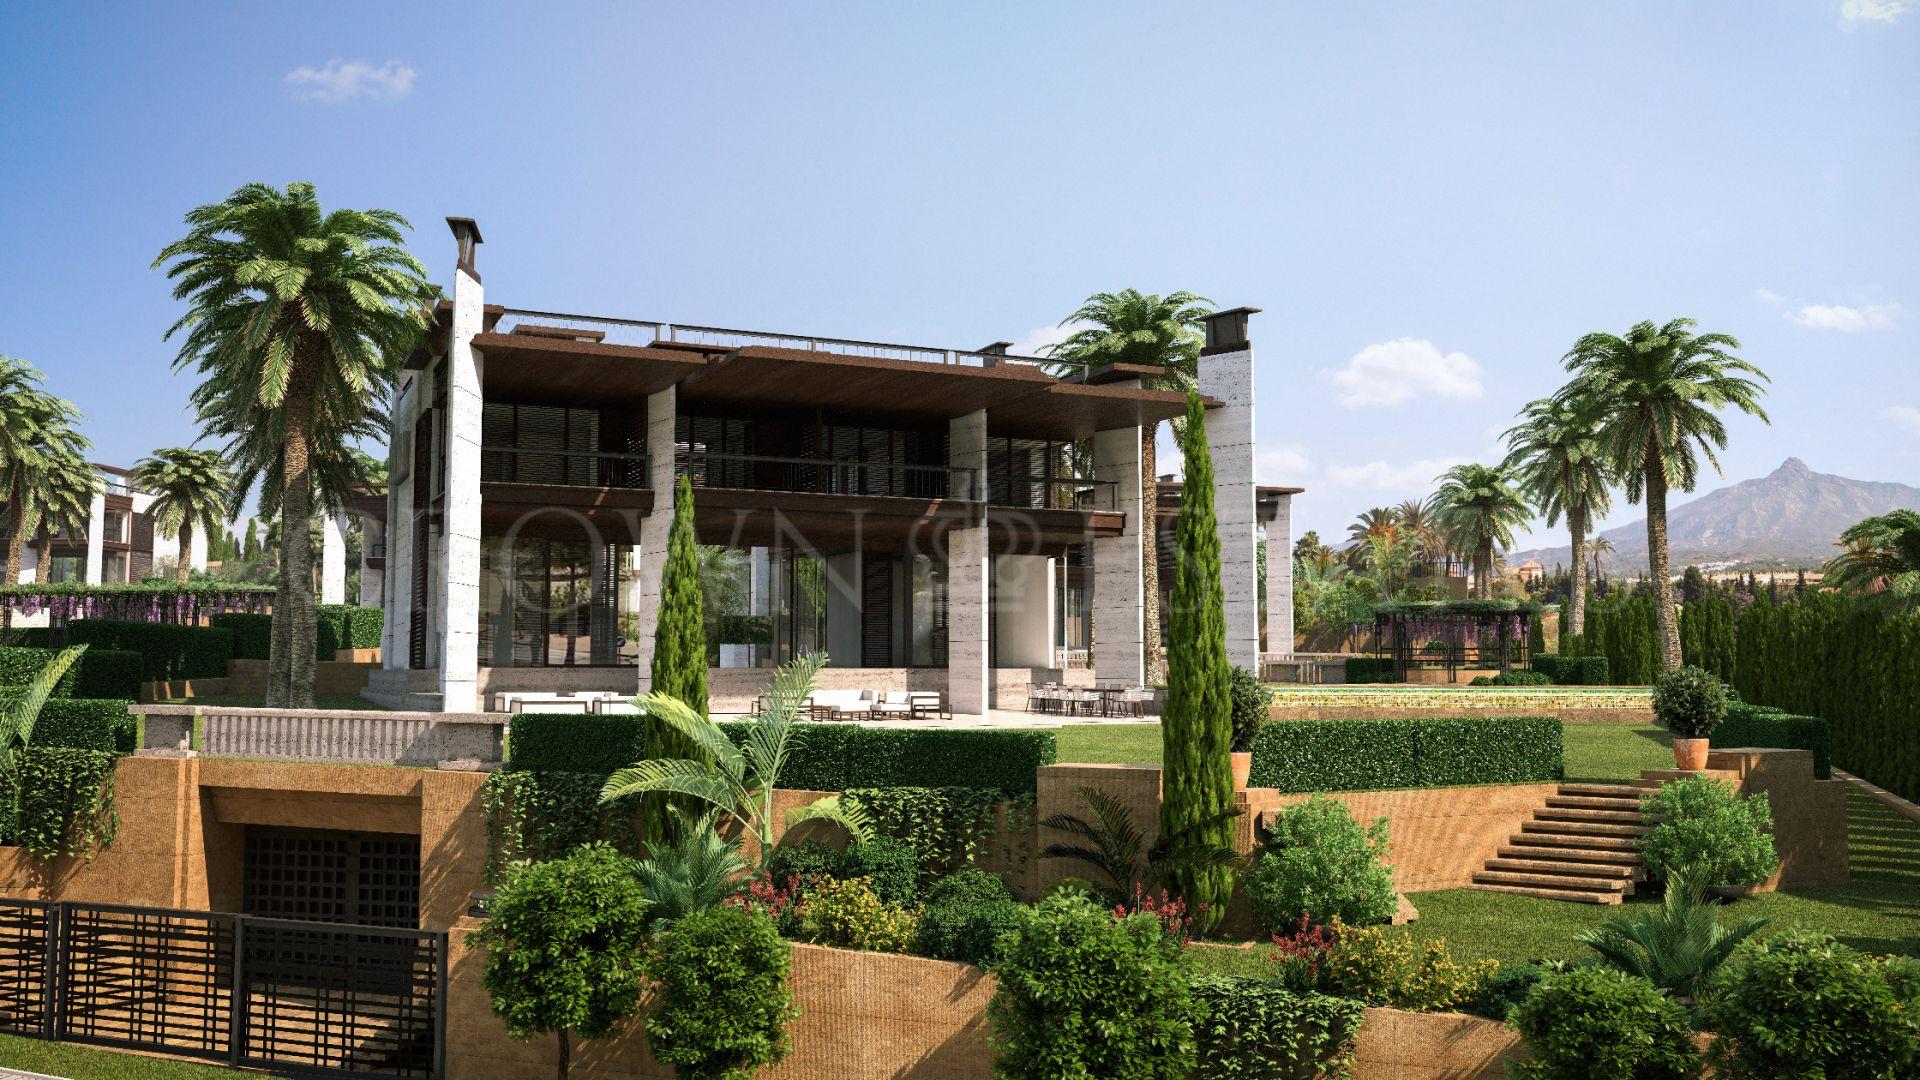 Los Palacetes de Banus, 8 stunning and elegant villas walking distance to Puerto Banús